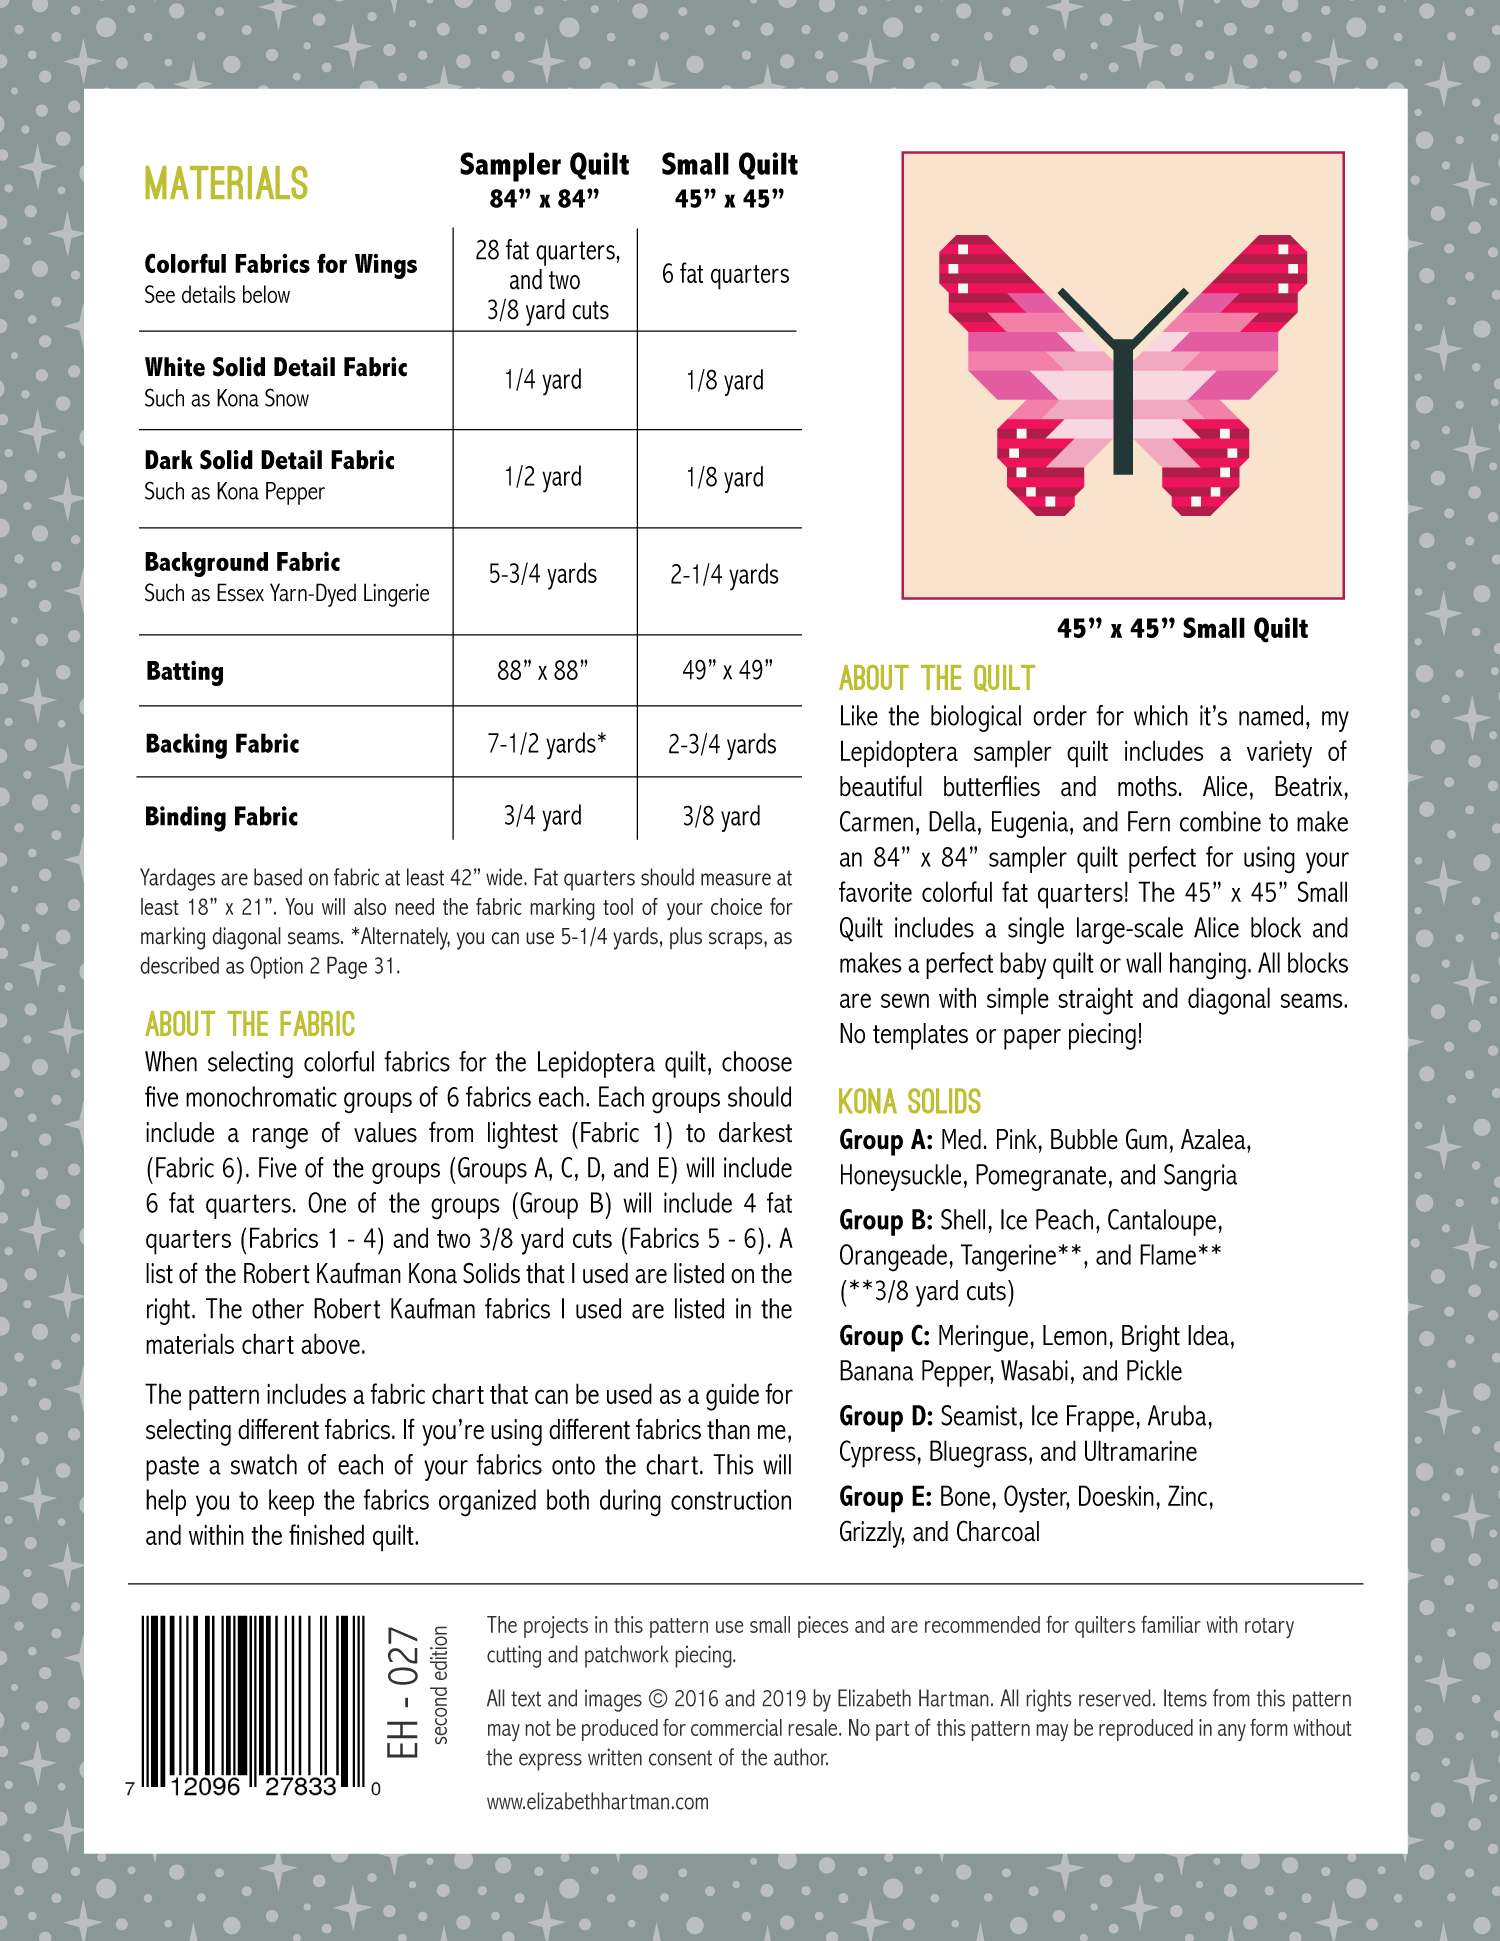 EH027-Lepidoptera-2-Back.jpg